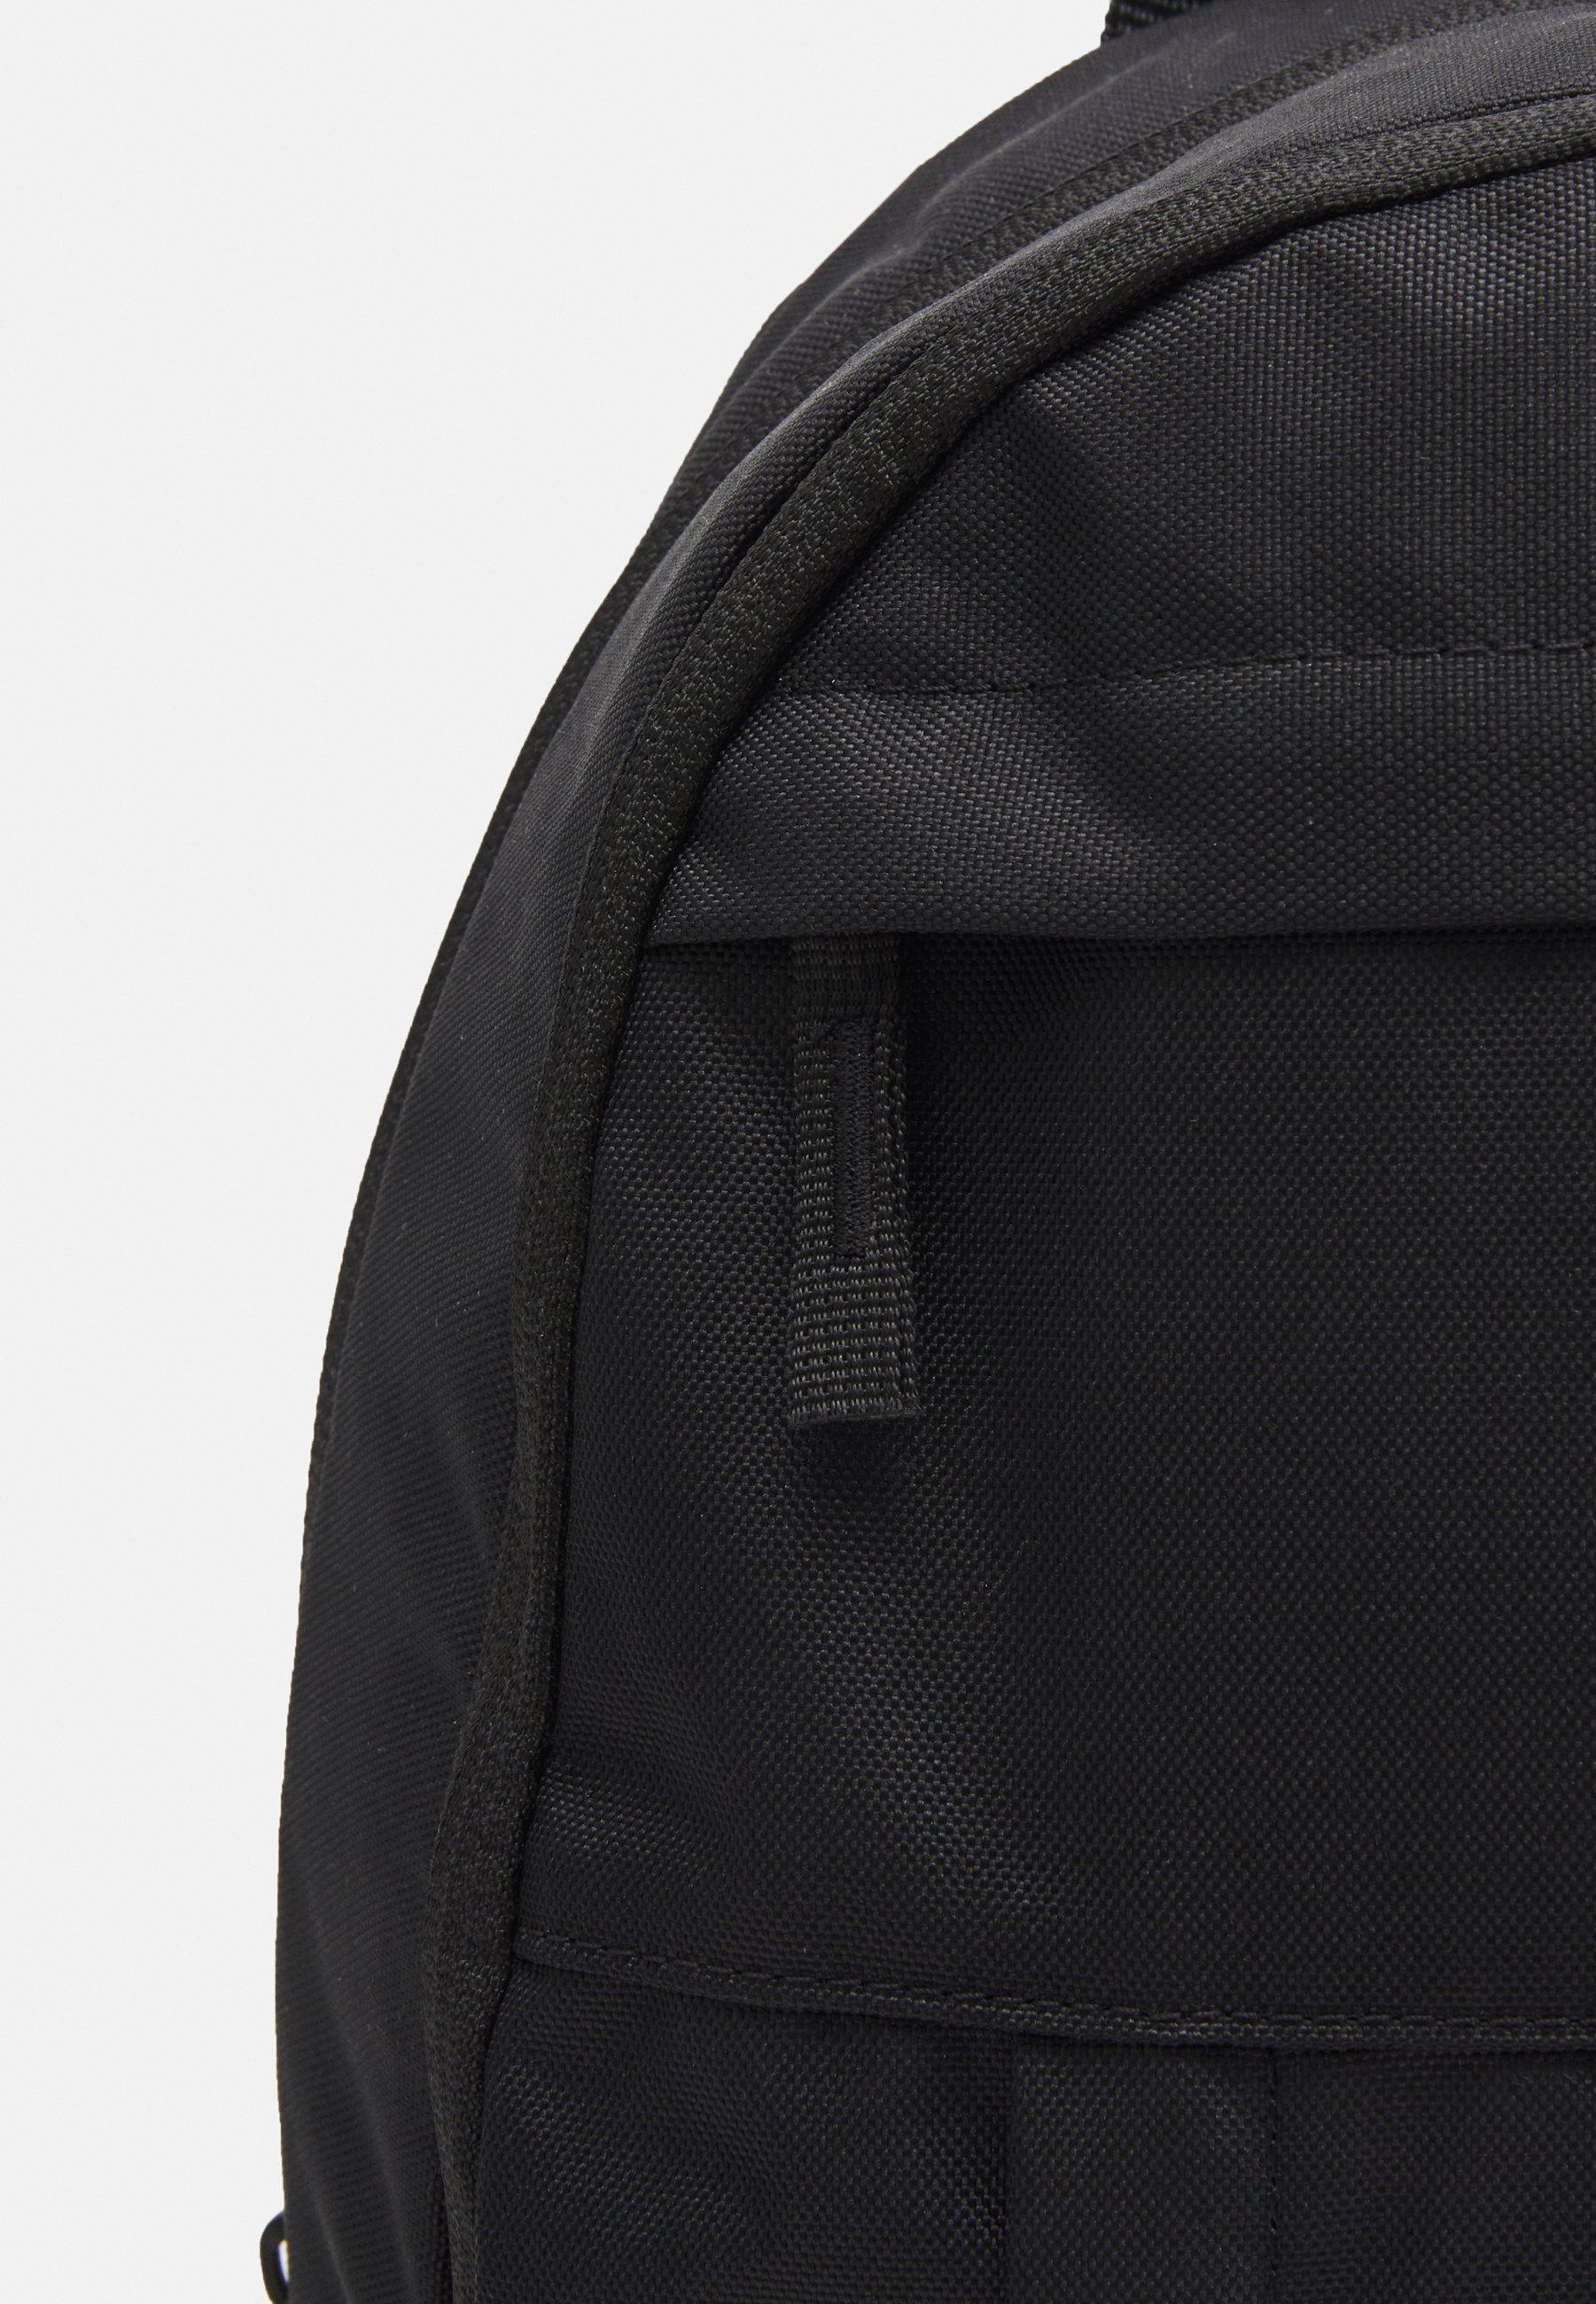 Nike Sportswear ELEMENTAL - Ryggsekk - black/metallic silver/svart KaDhw27PyvprkSD